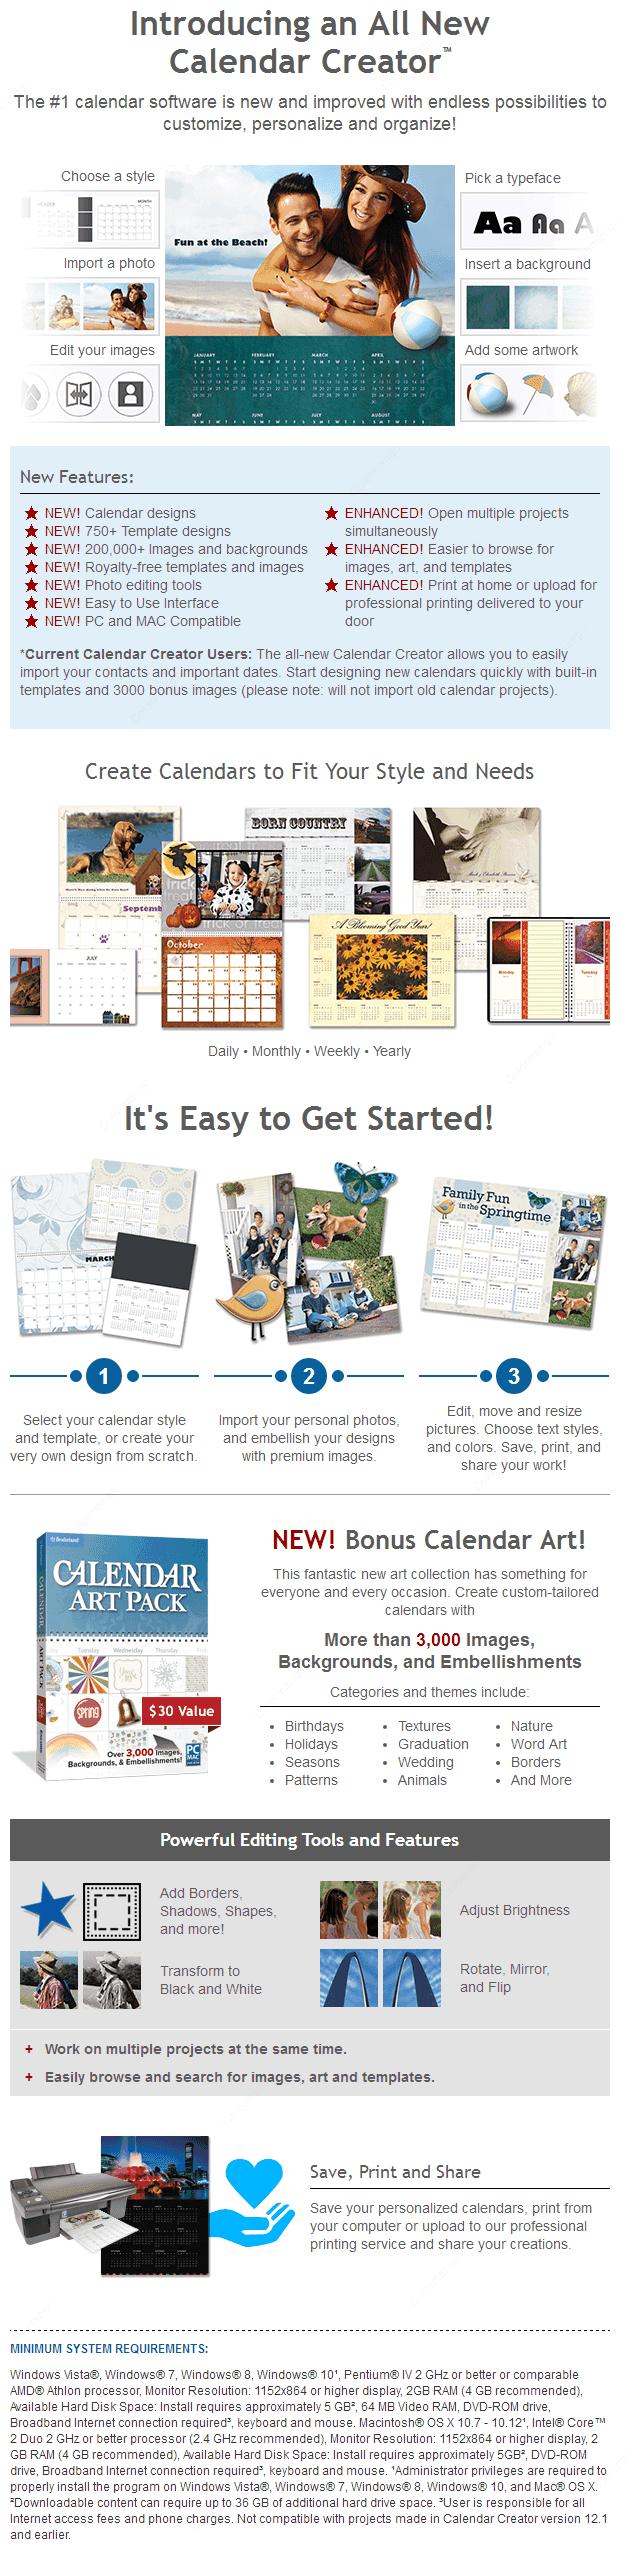 calendar creator online shopping preis gratis testversion